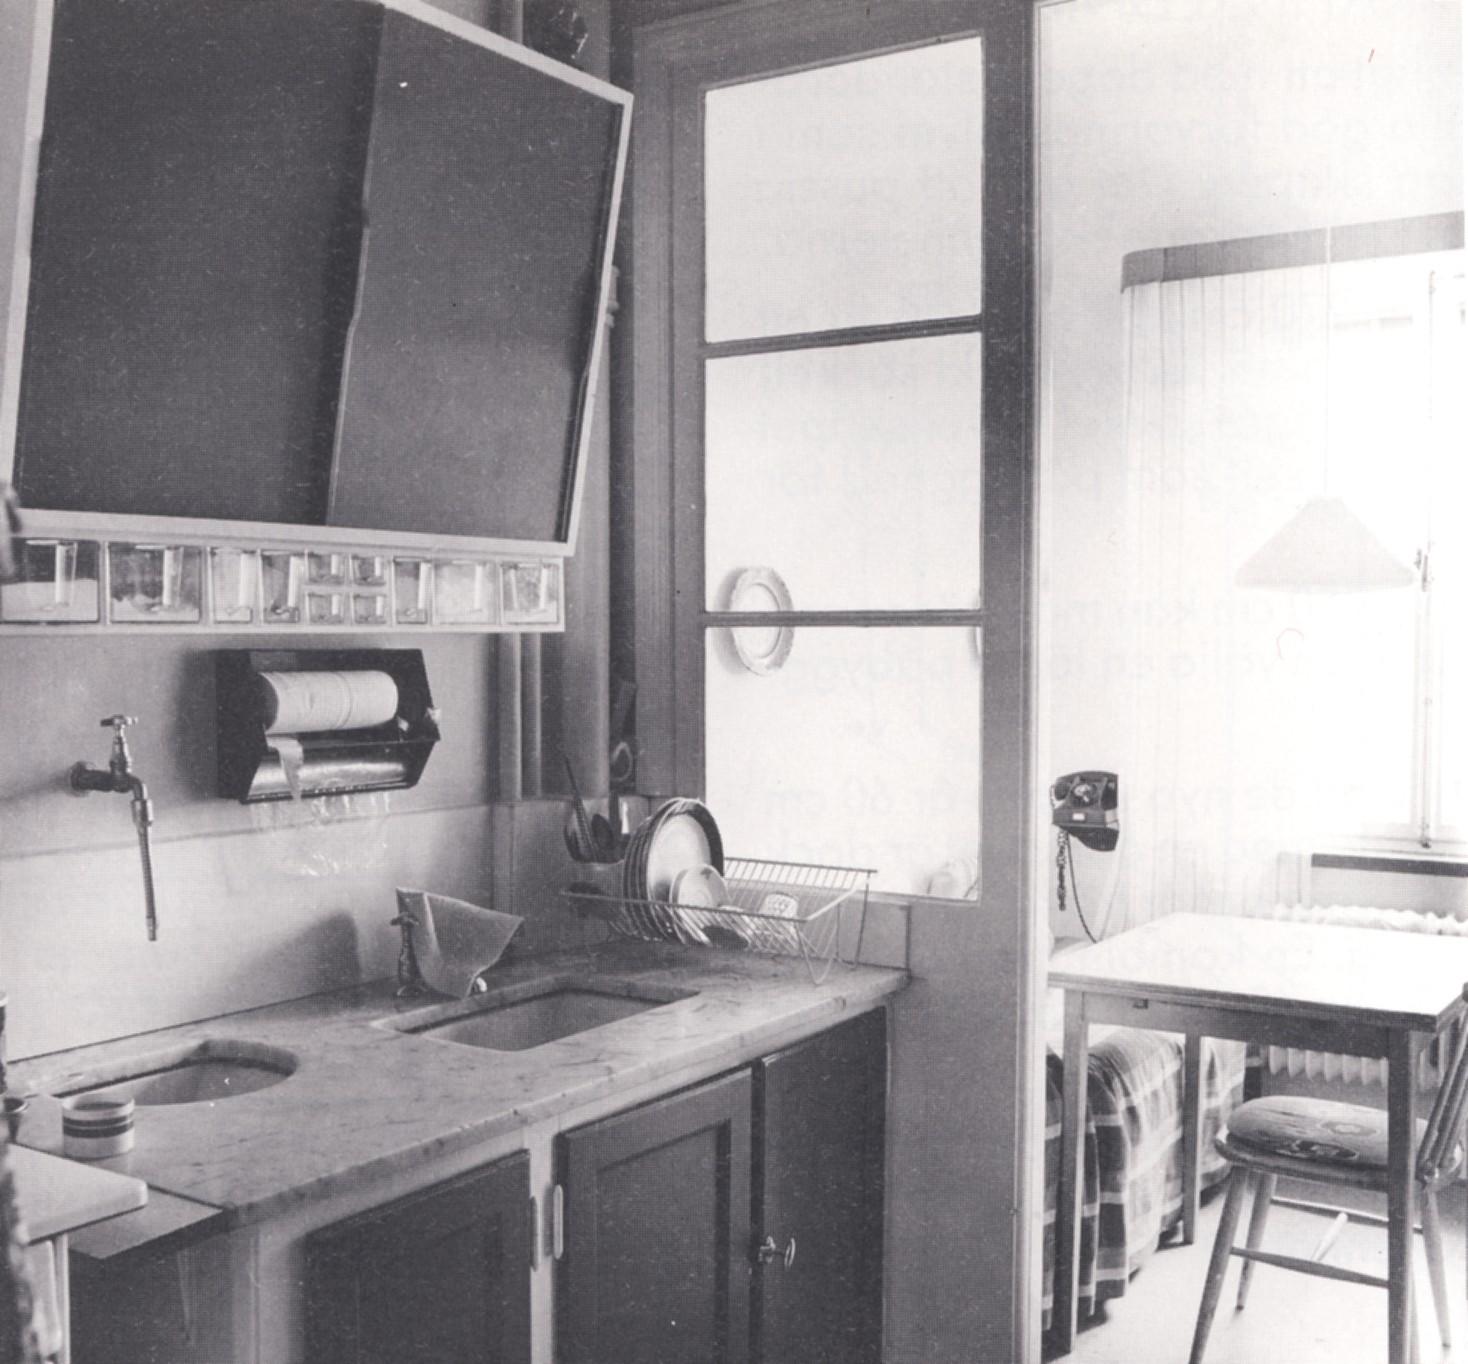 download badezimmer 1930 | vitaplaza, Badezimmer ideen